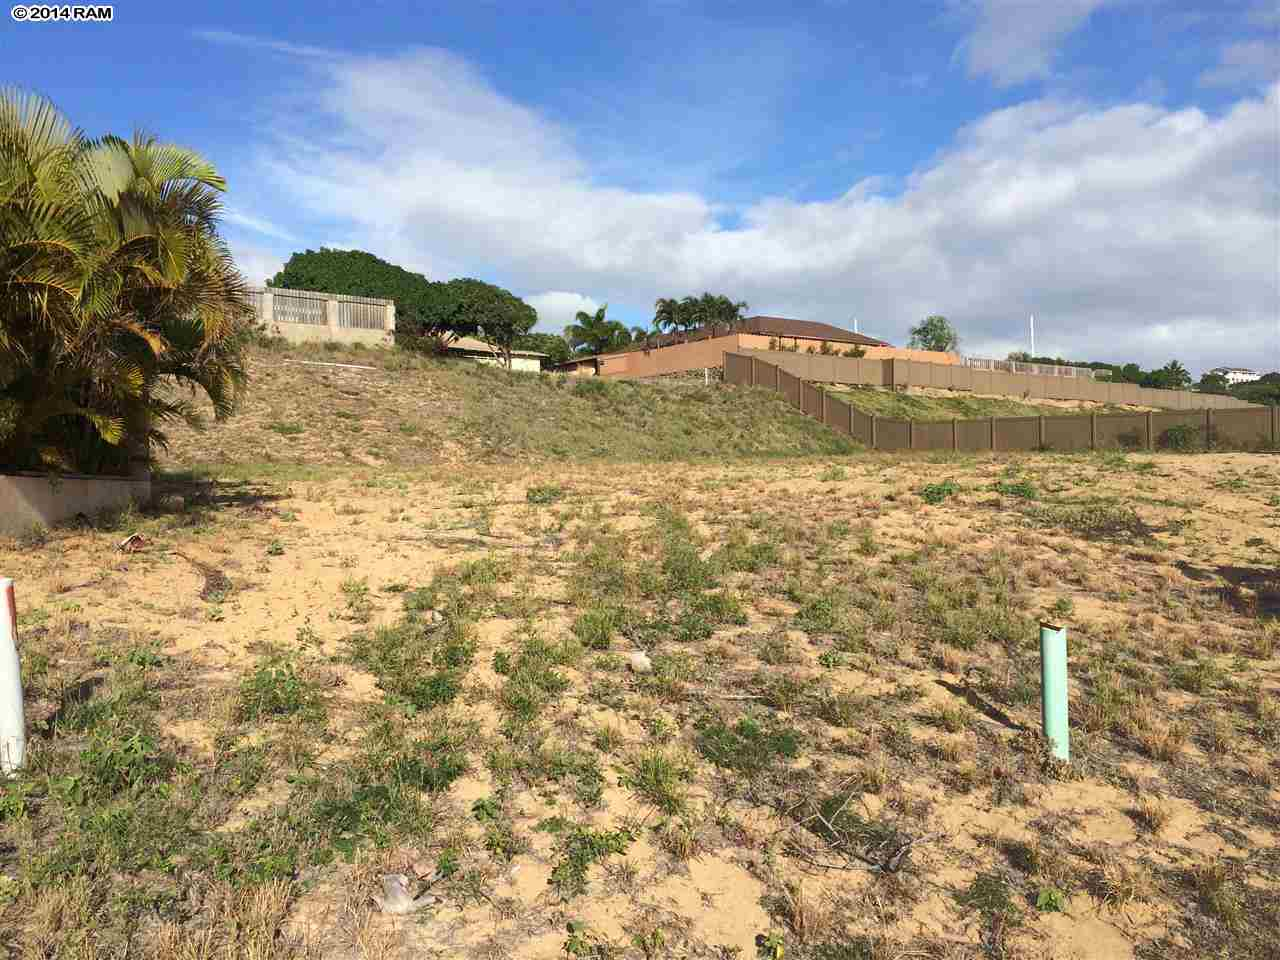 68 Keoneloa St Lot 31 Wailuku, Hi 96793 vacant land - photo 2 of 8